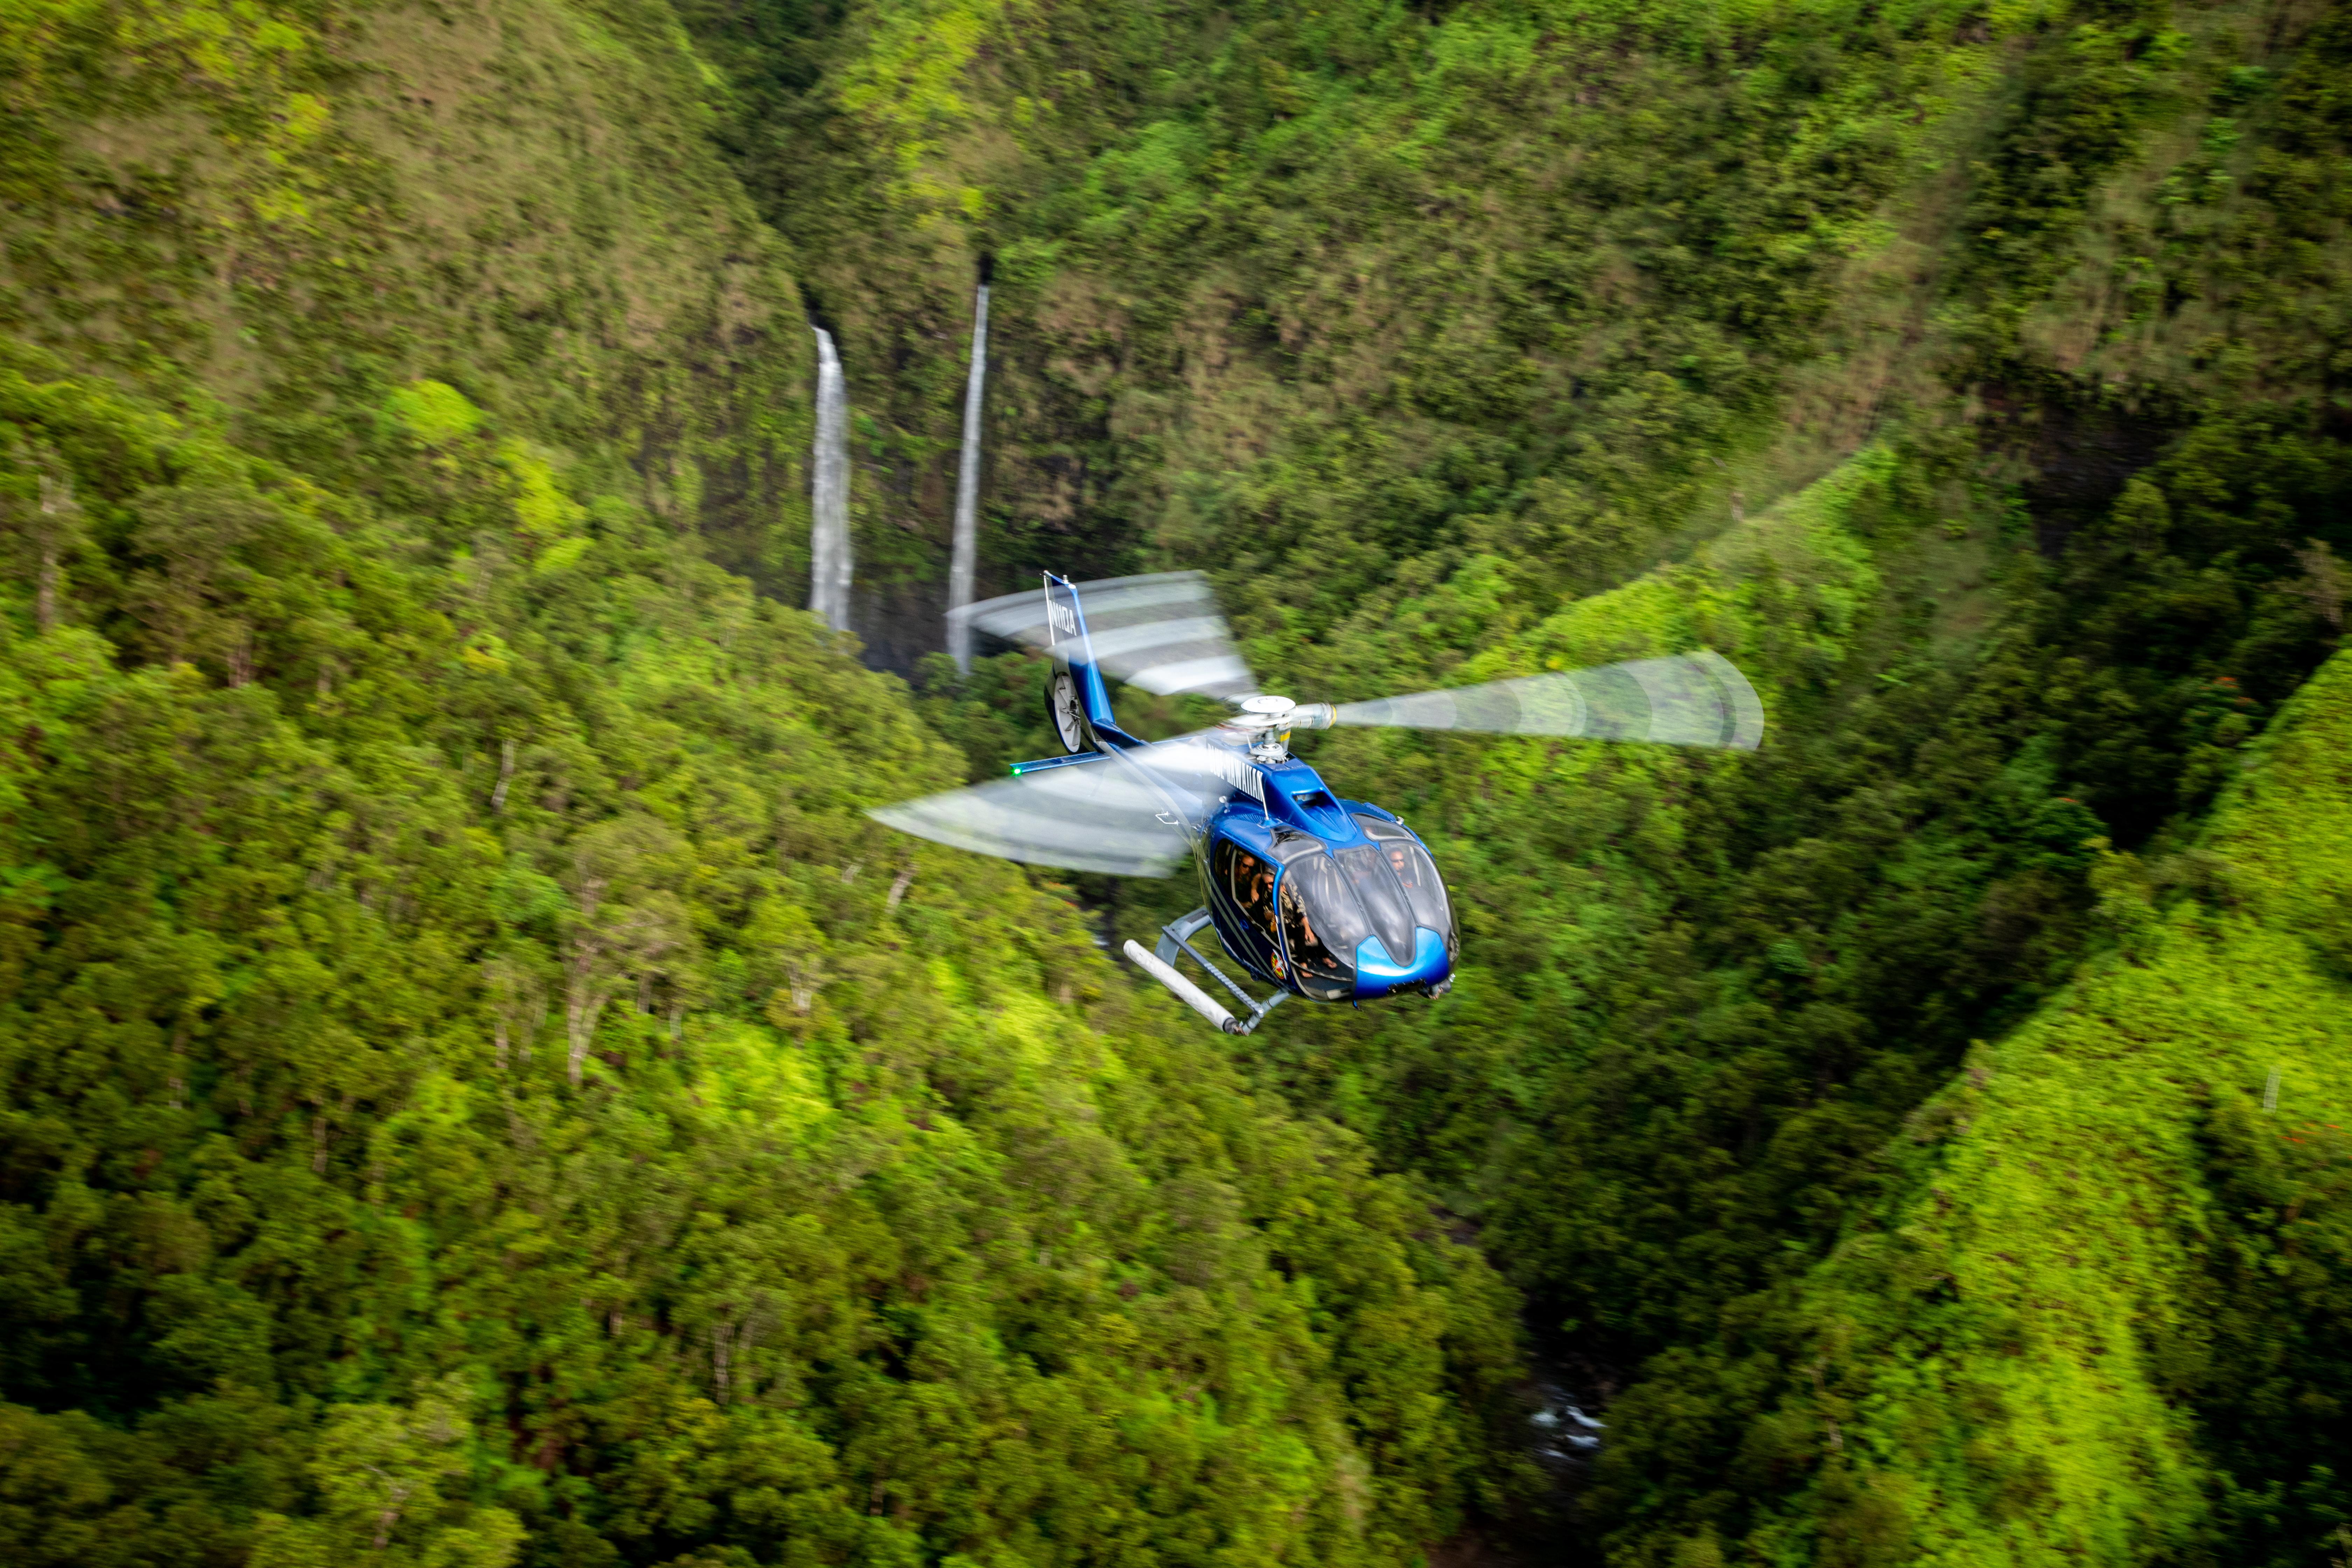 Product Kohala Coast Valleys & Waterfalls Helicopter Tour